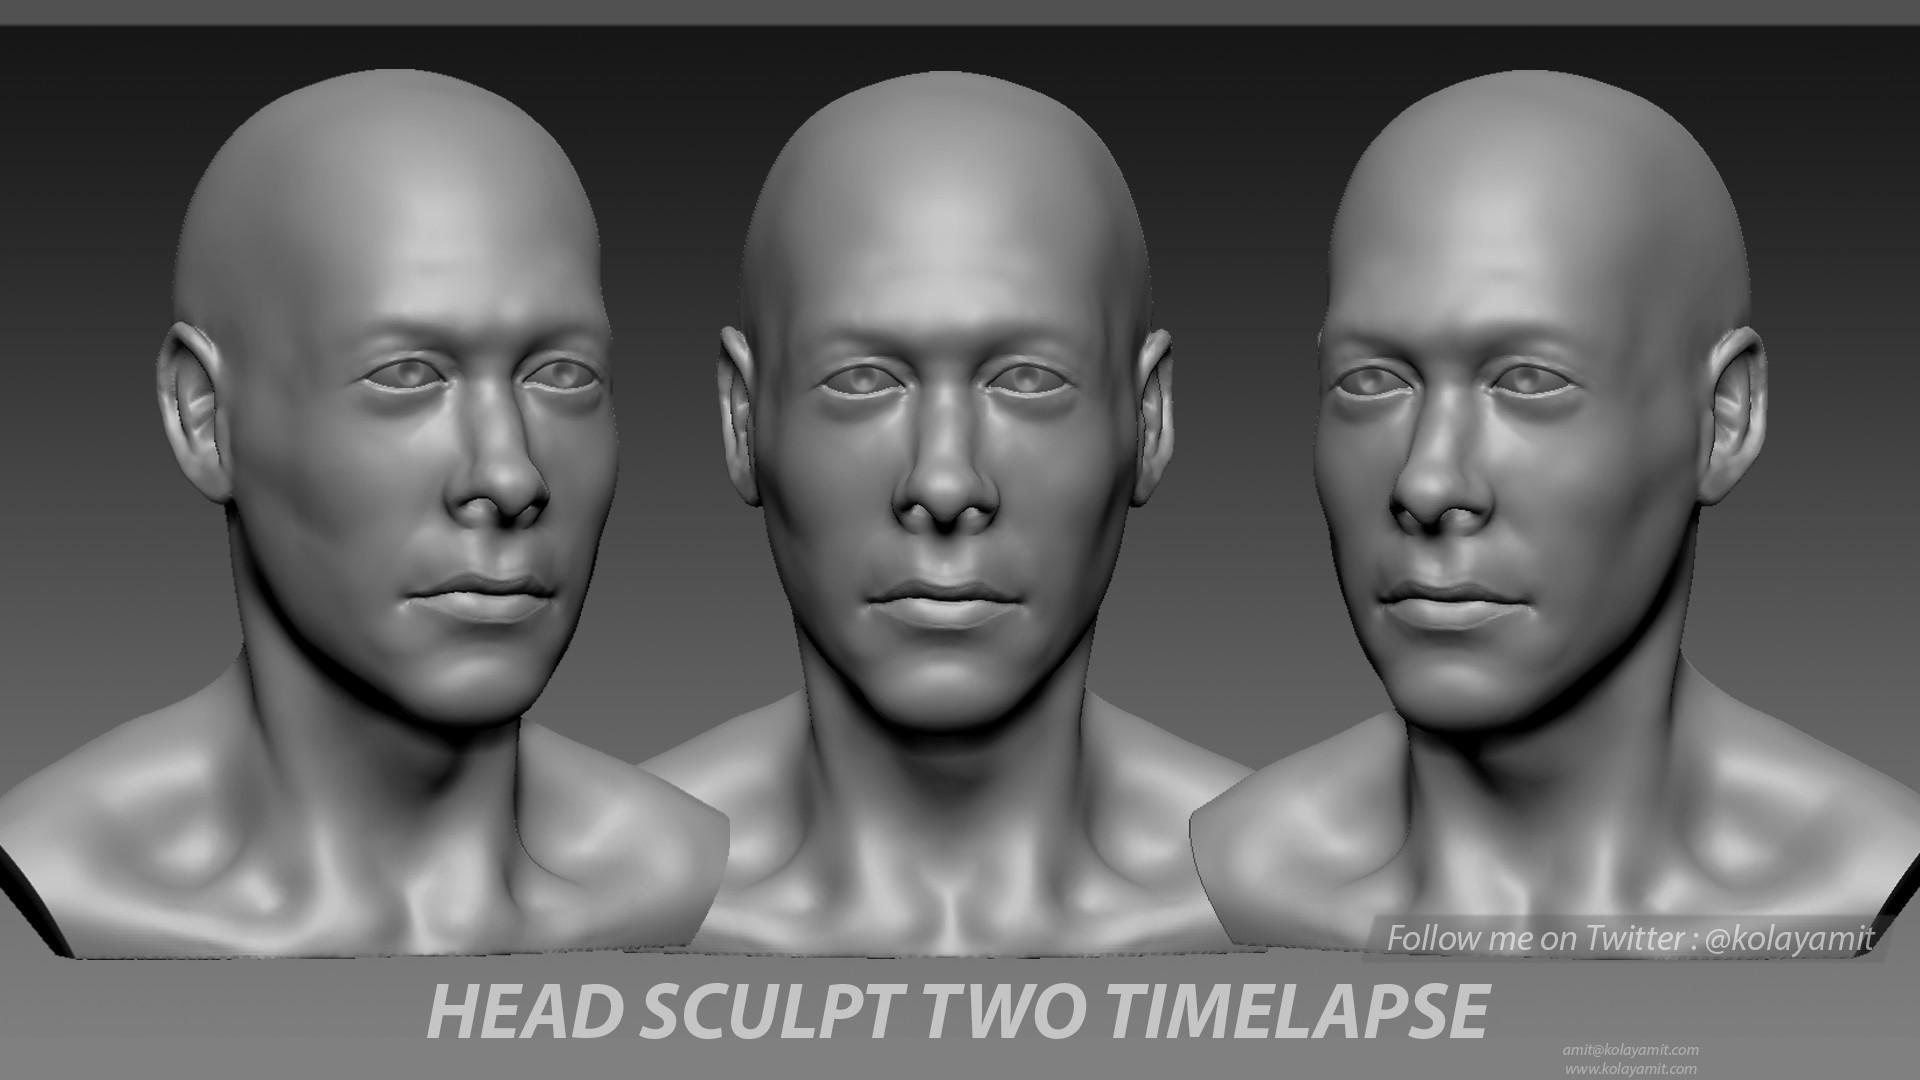 Head Sculpt Two Timelapse.